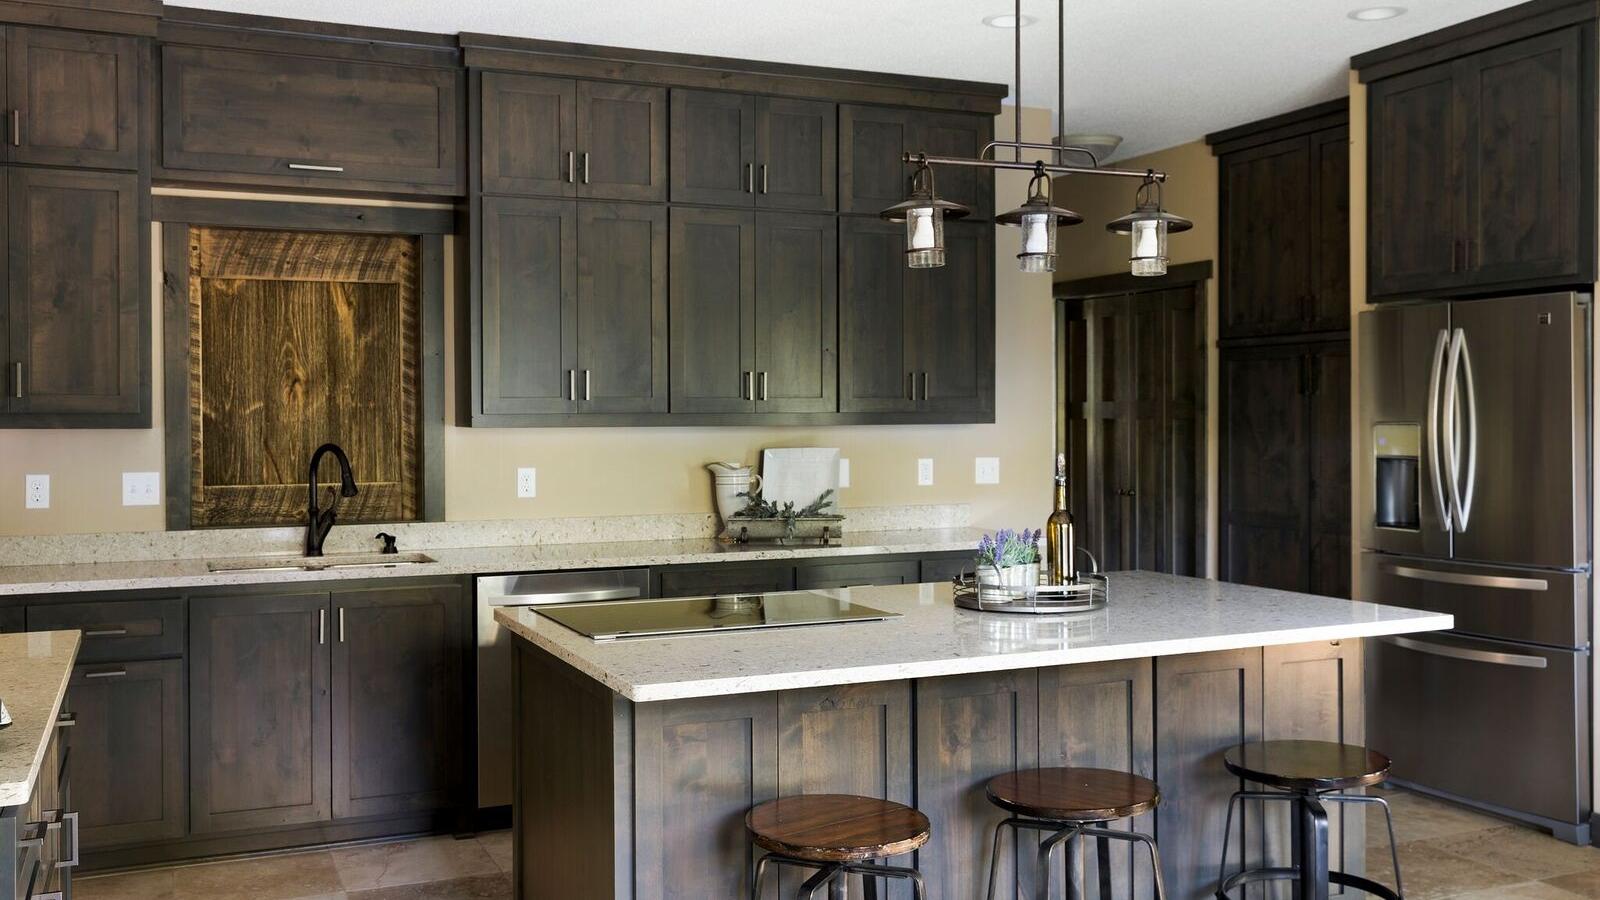 Moms Design Build - Rustic Modern Farmhouse Kitchen